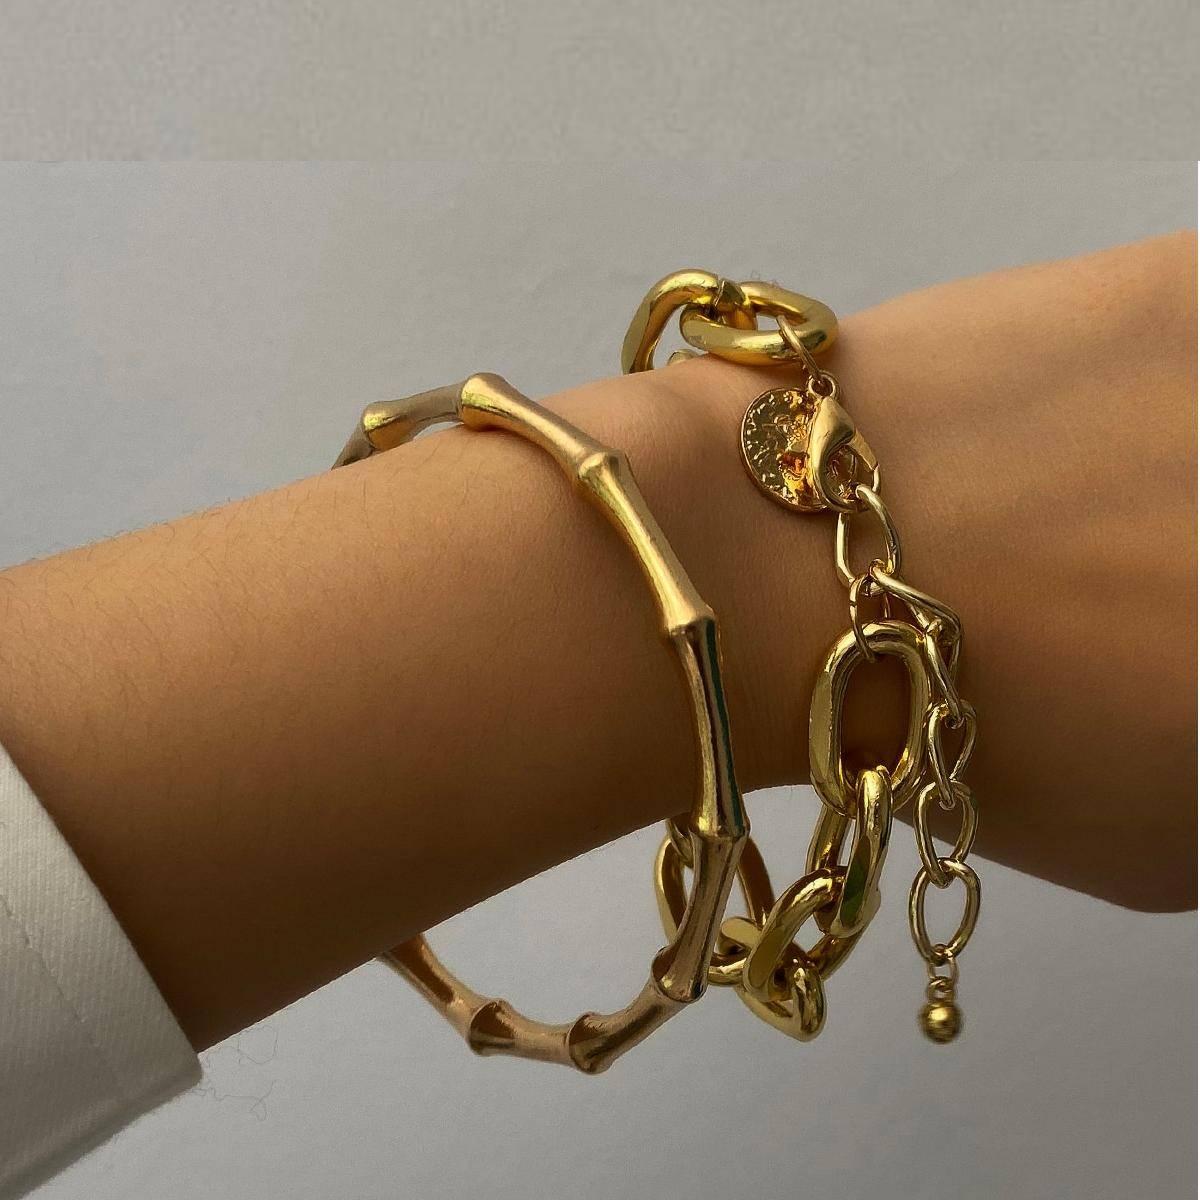 Punk Bamboo Chunky Chain Bracelet 2Pcs/Set – RANTI Bangles Bracelets 8d255f28538fbae46aeae7: Gold Set|silver color